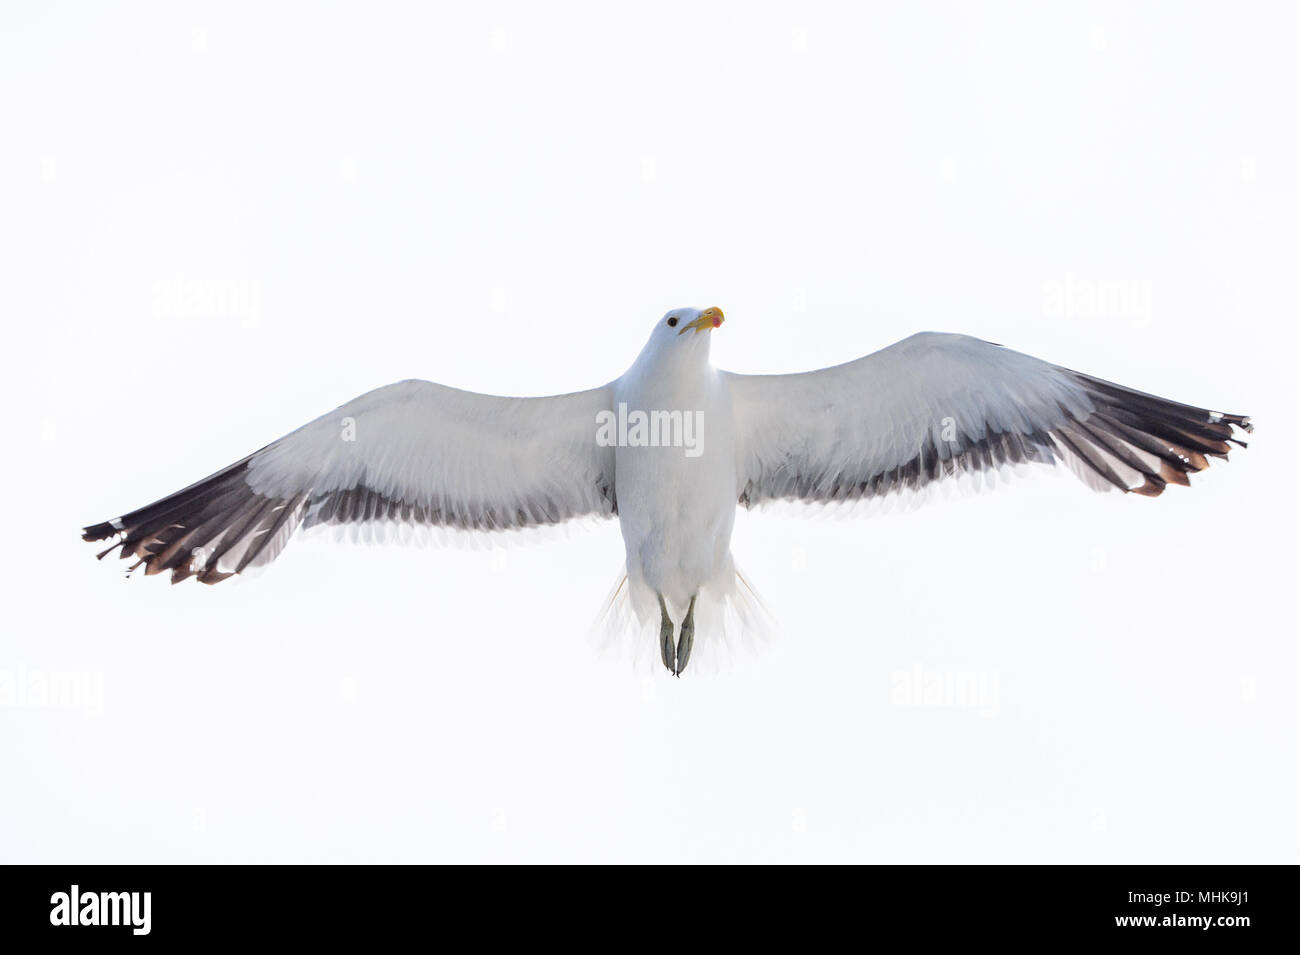 Albatross of the Walvis Bay, Namibia - Stock Image